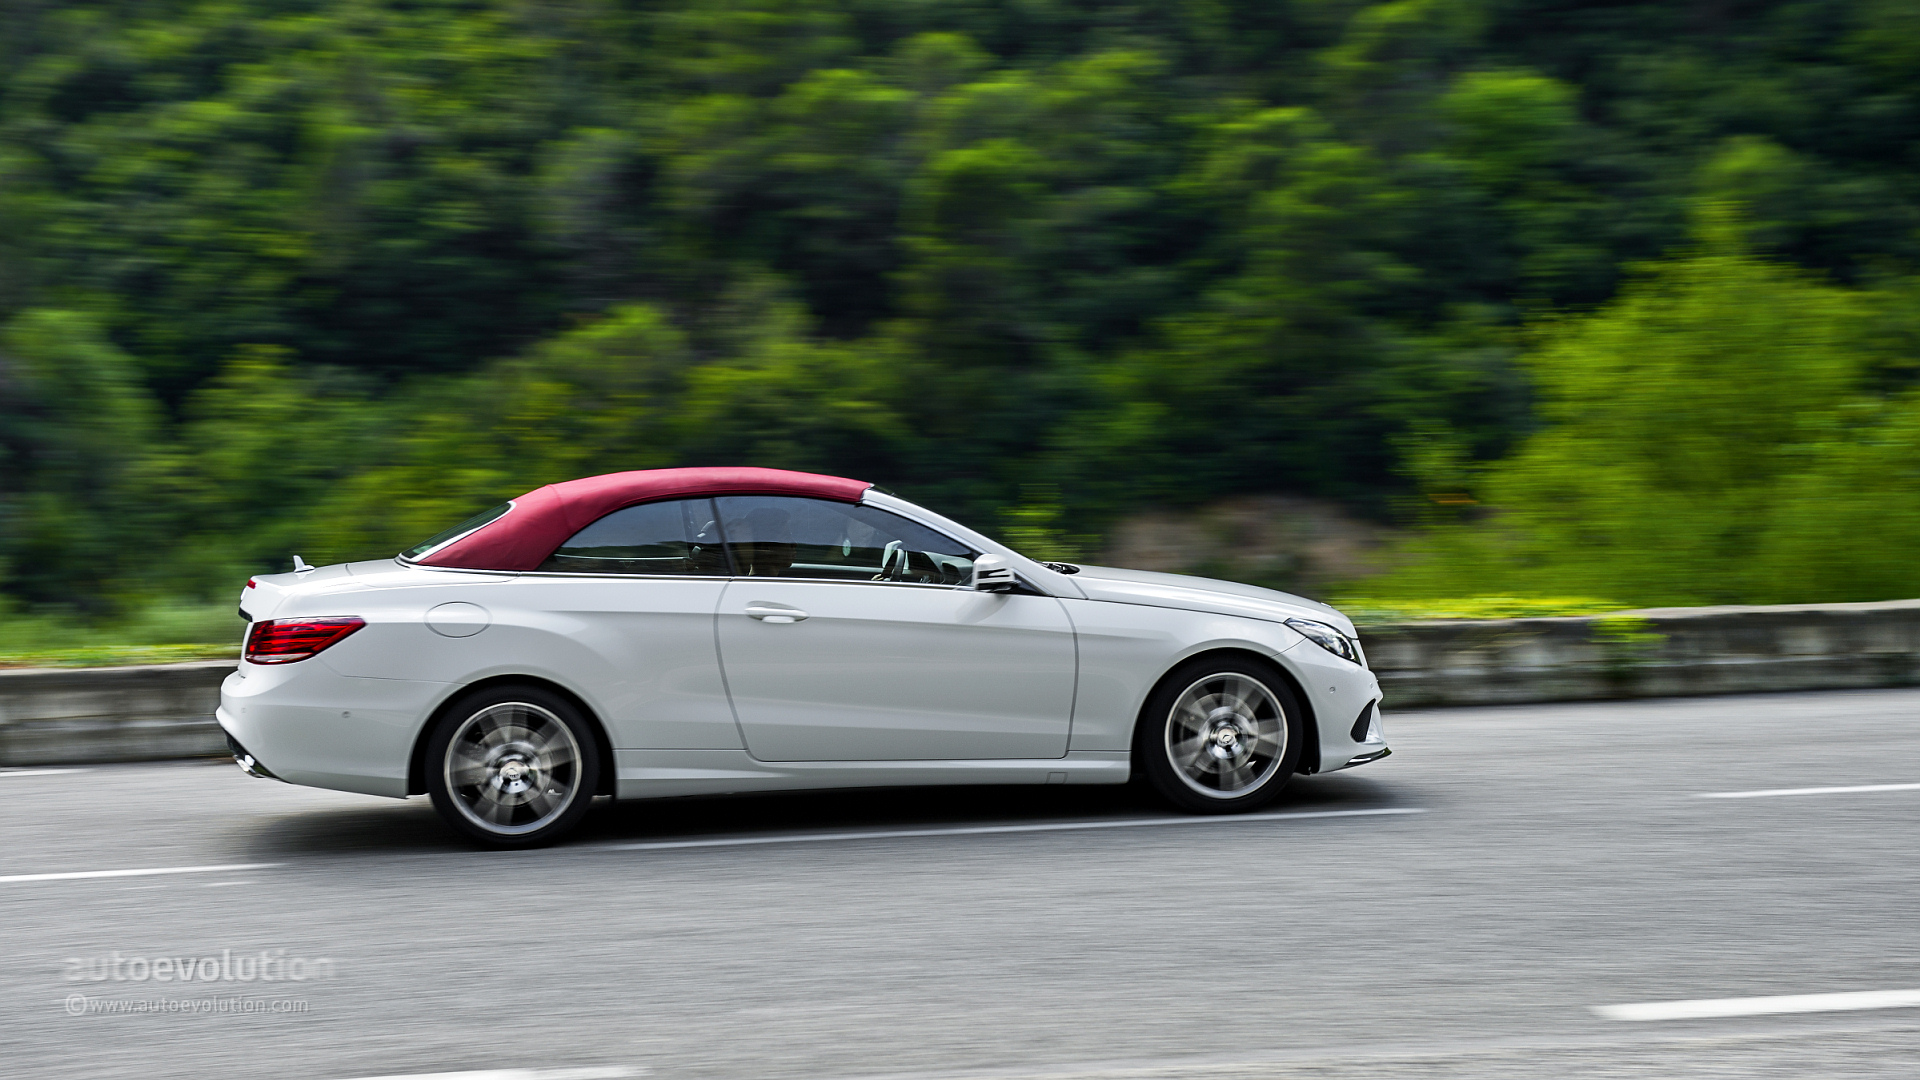 Mercedes benz e 250 cgi cabriolet tested by autoevolution for Mercedes benz e 250